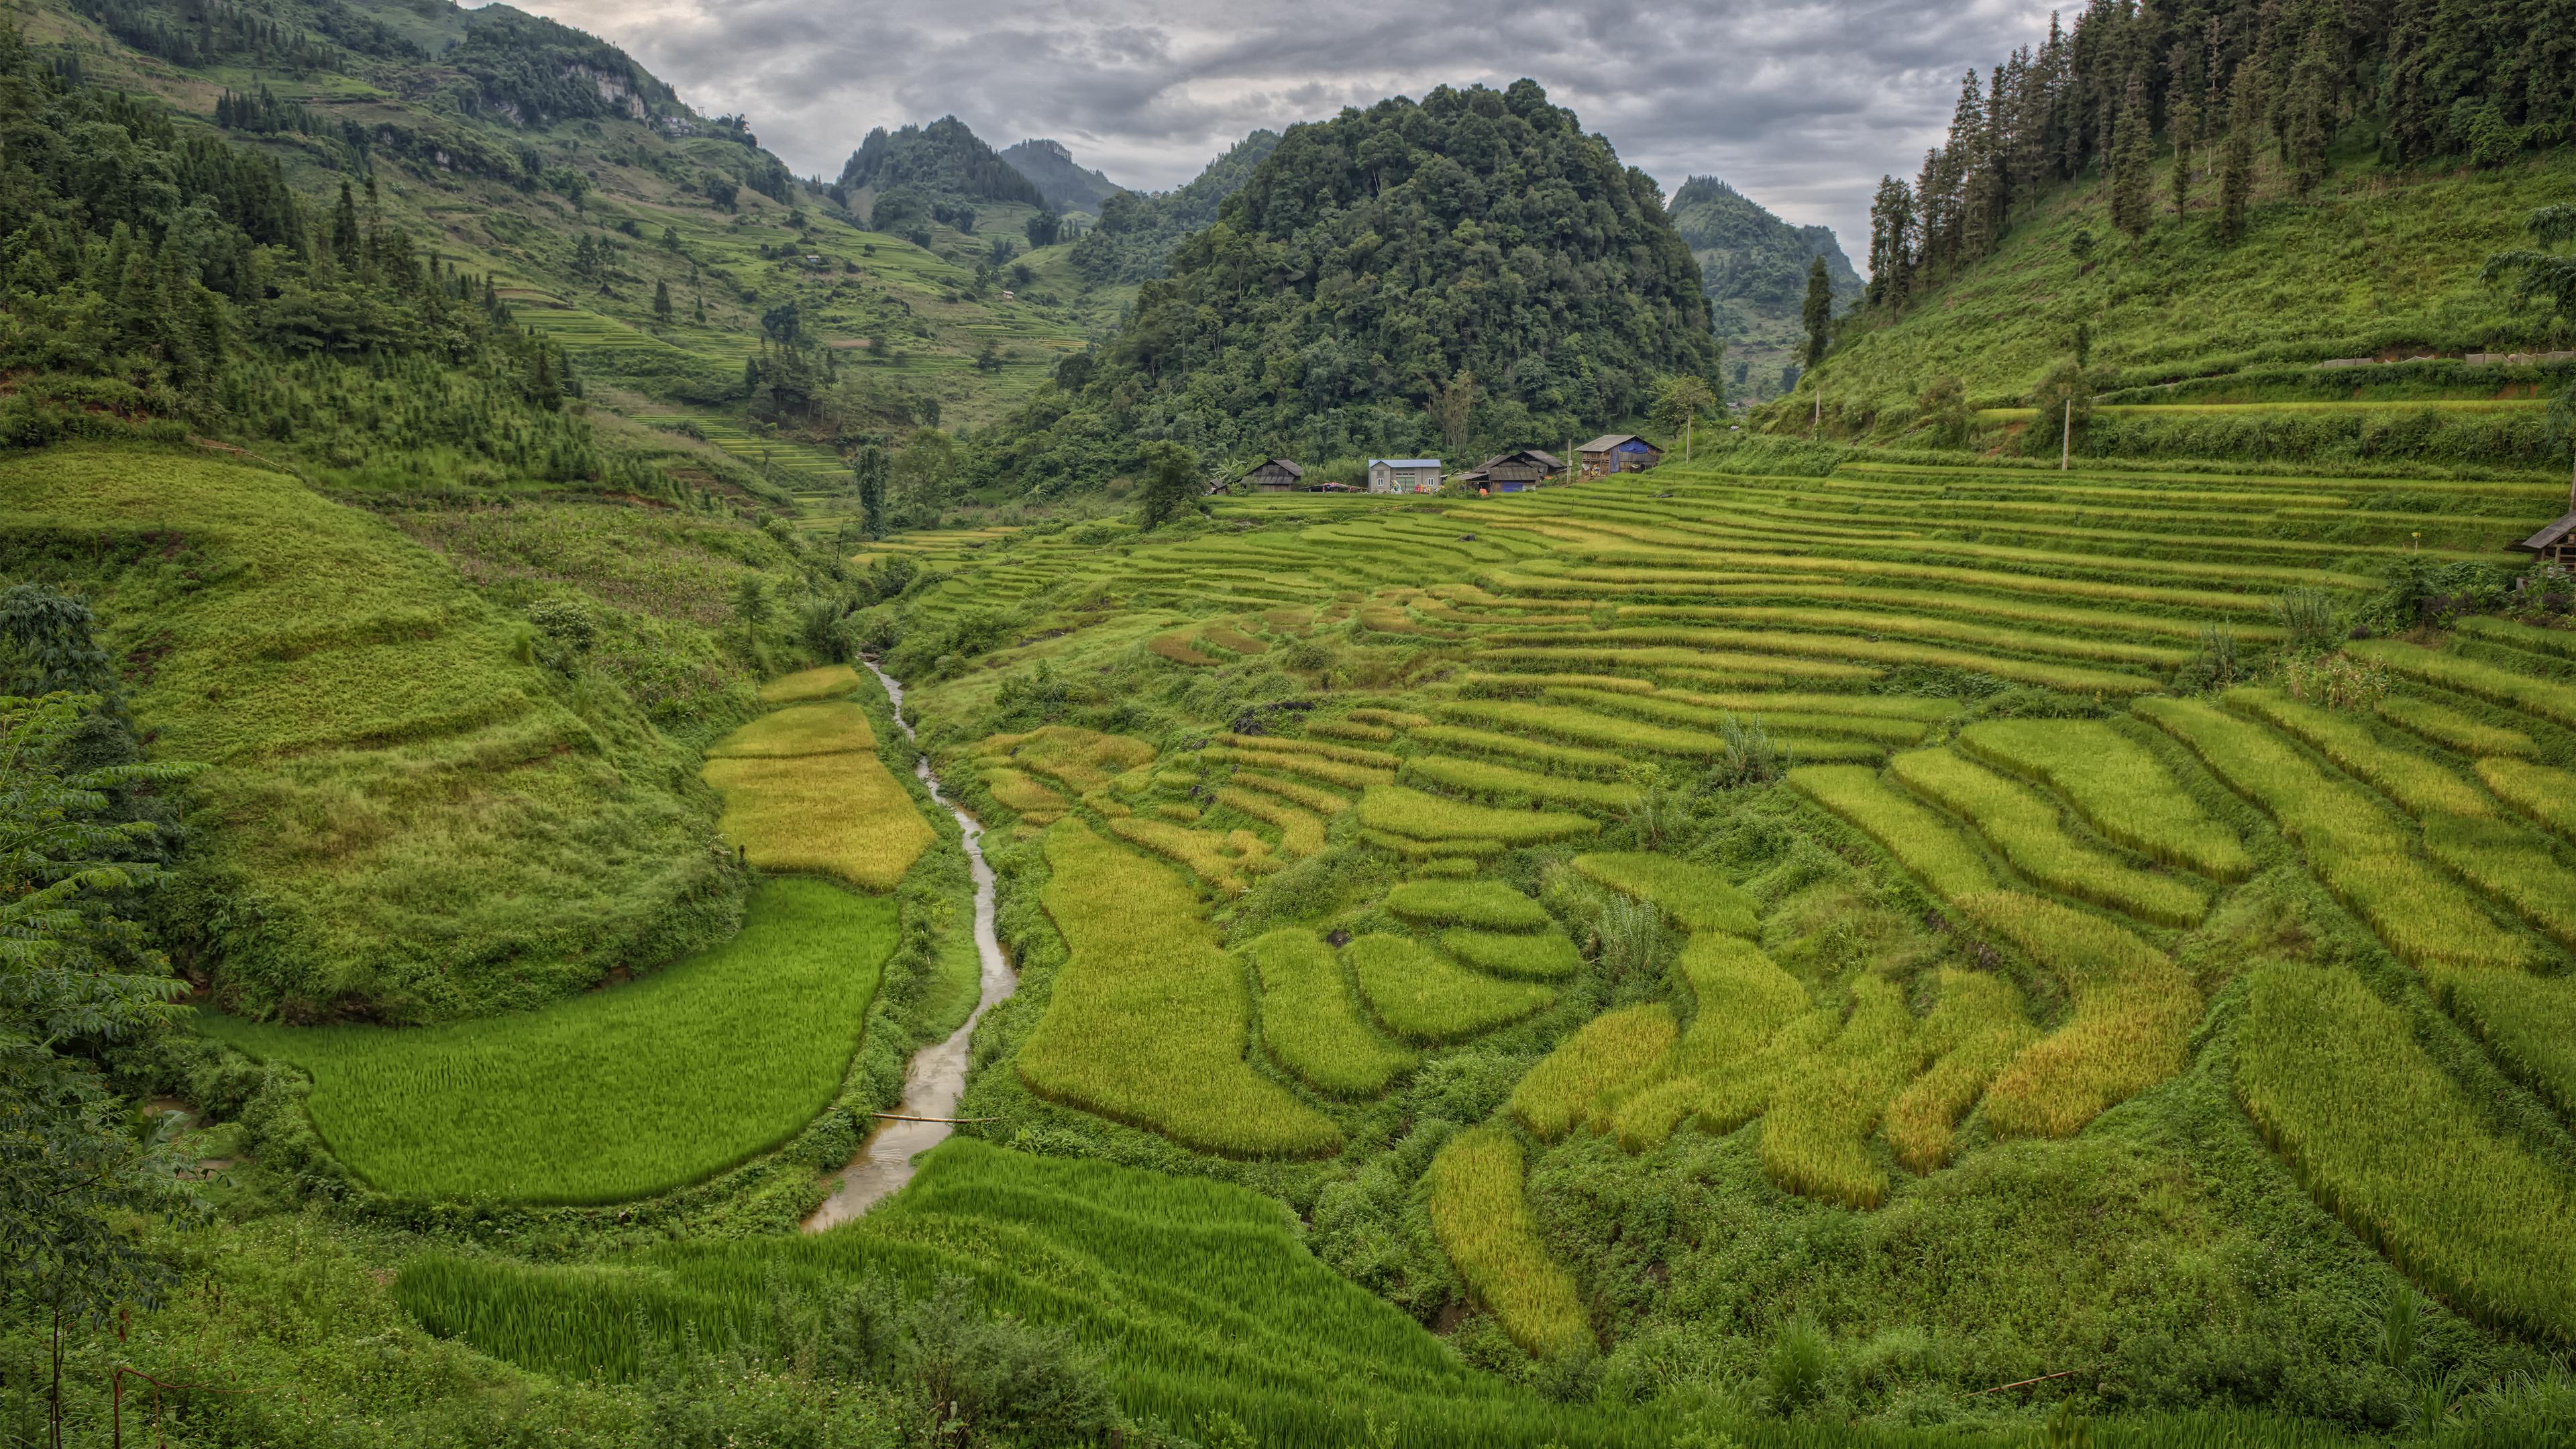 A Beautiful View around Lao Cai